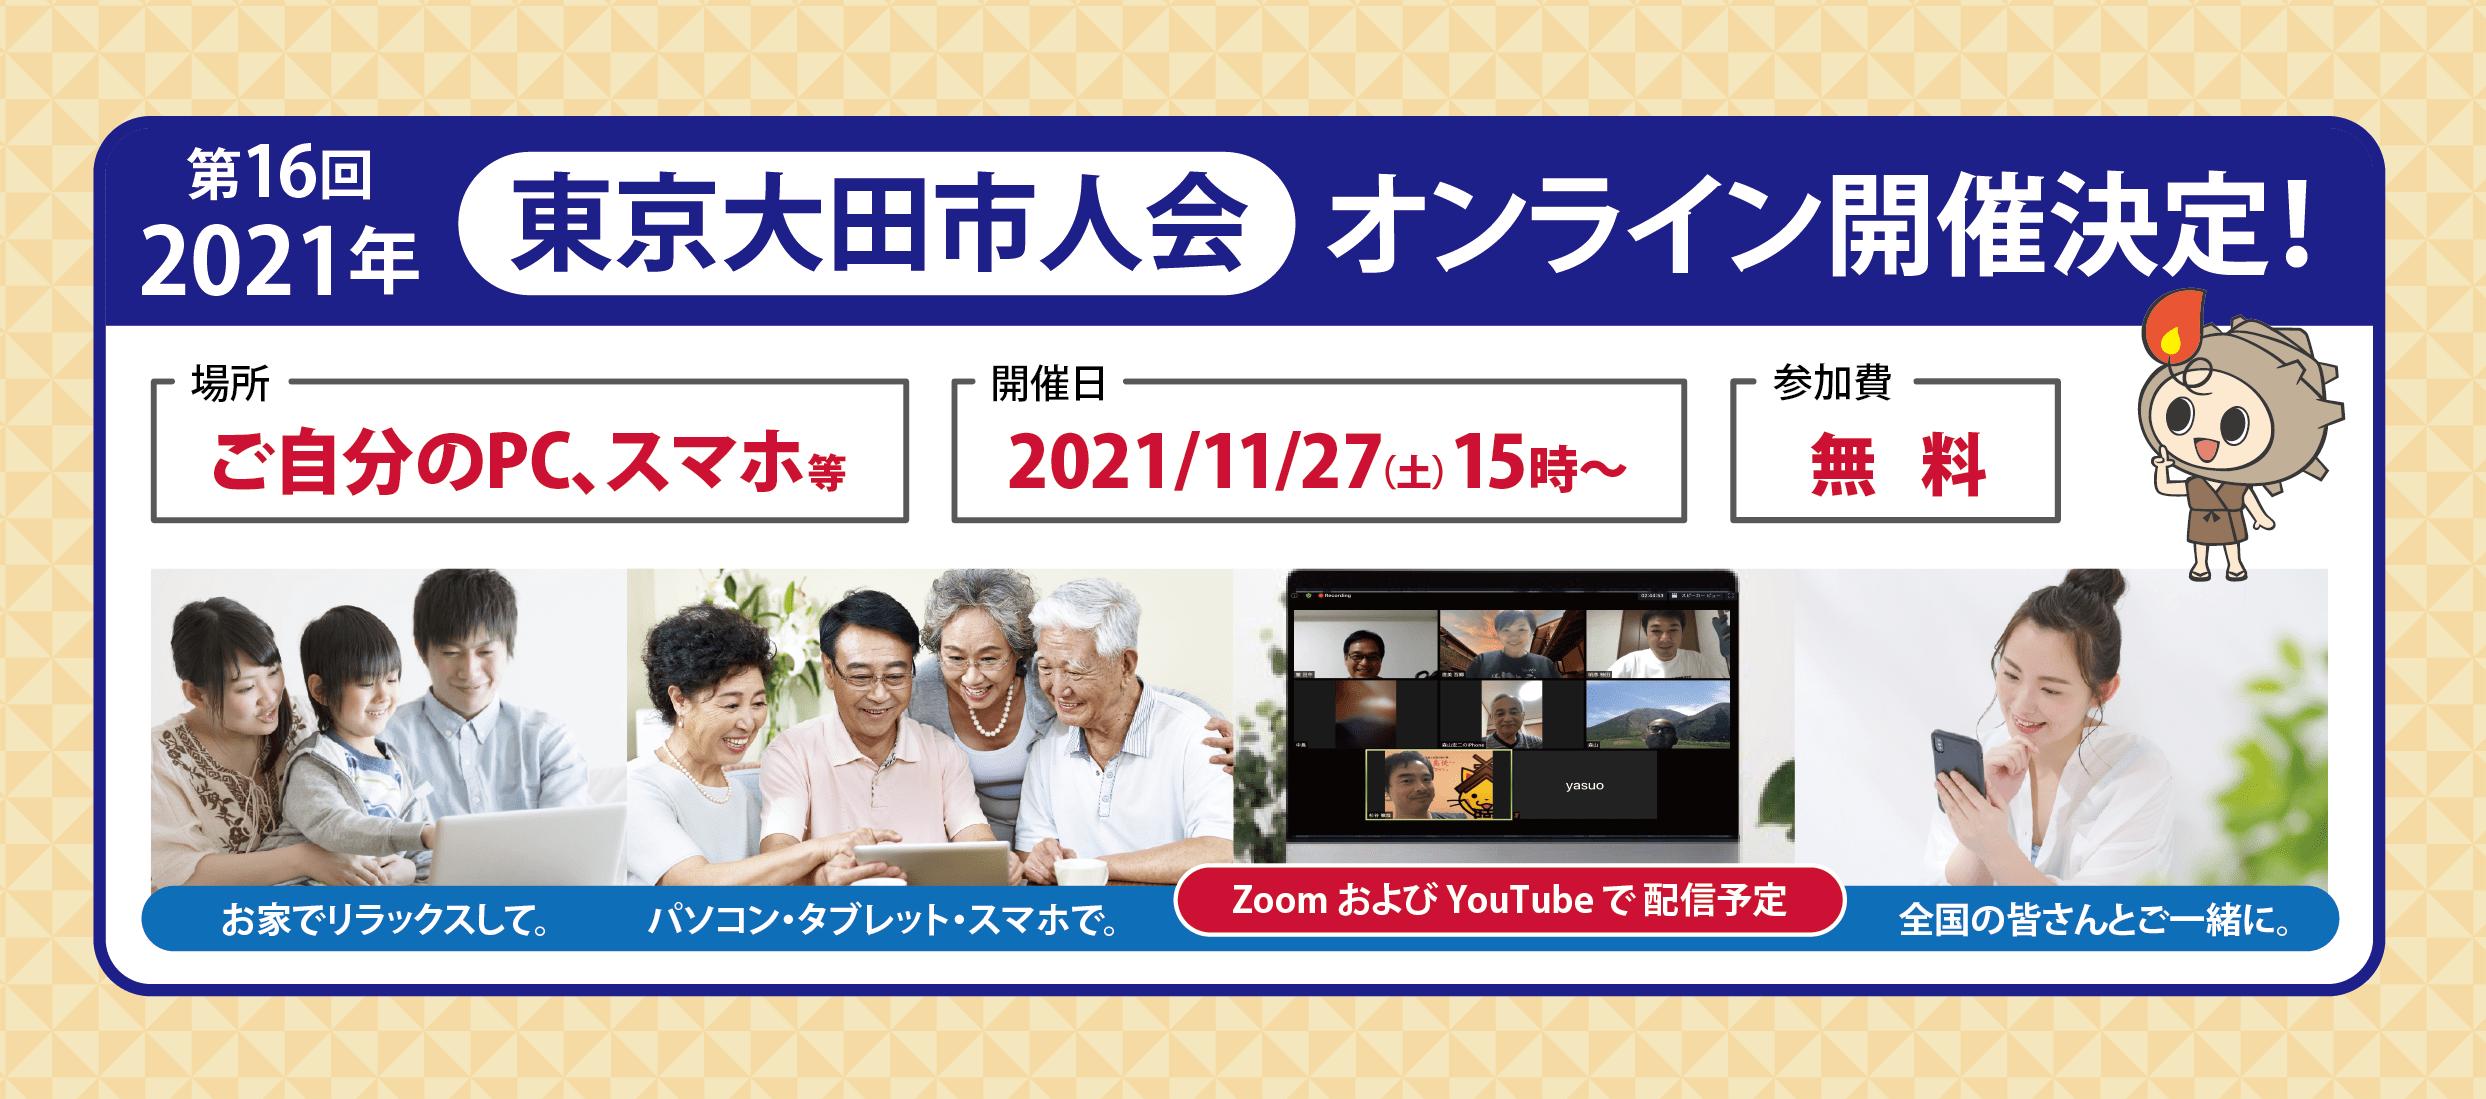 2021年 東京大田市人会 オンライン開催決定!